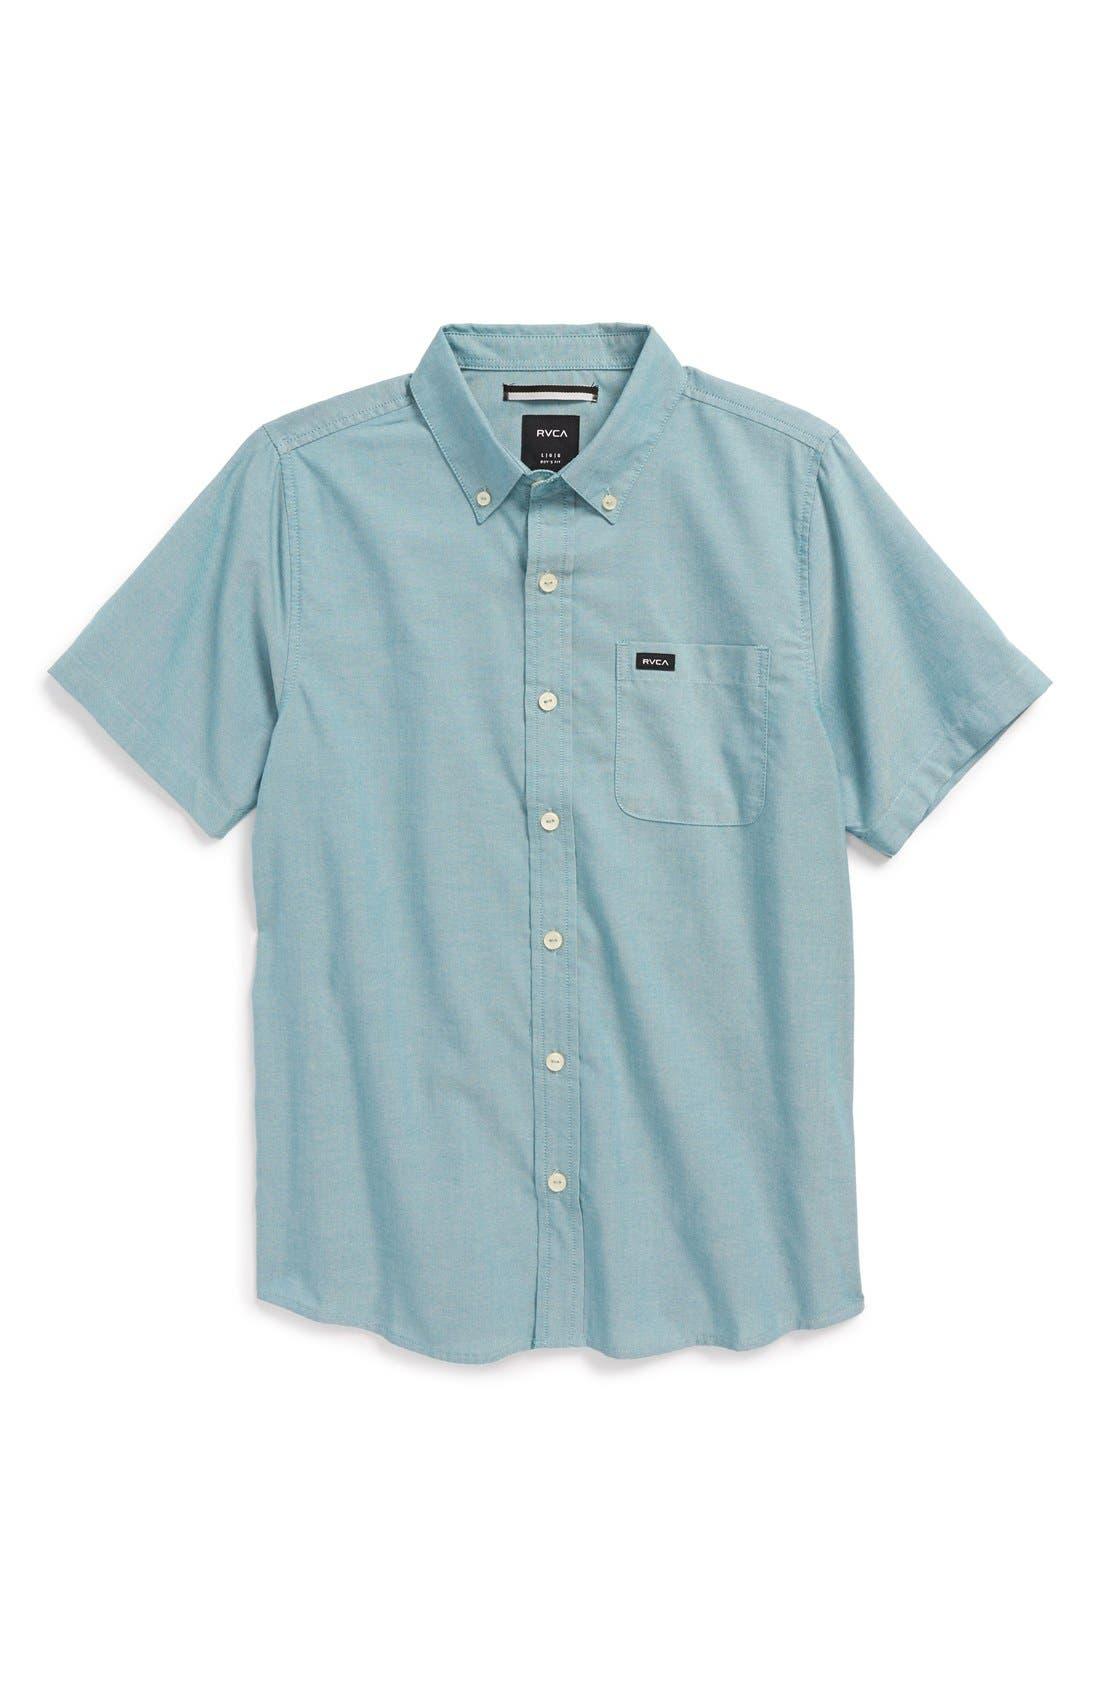 'That'll Do' Woven Shirt,                             Main thumbnail 13, color,